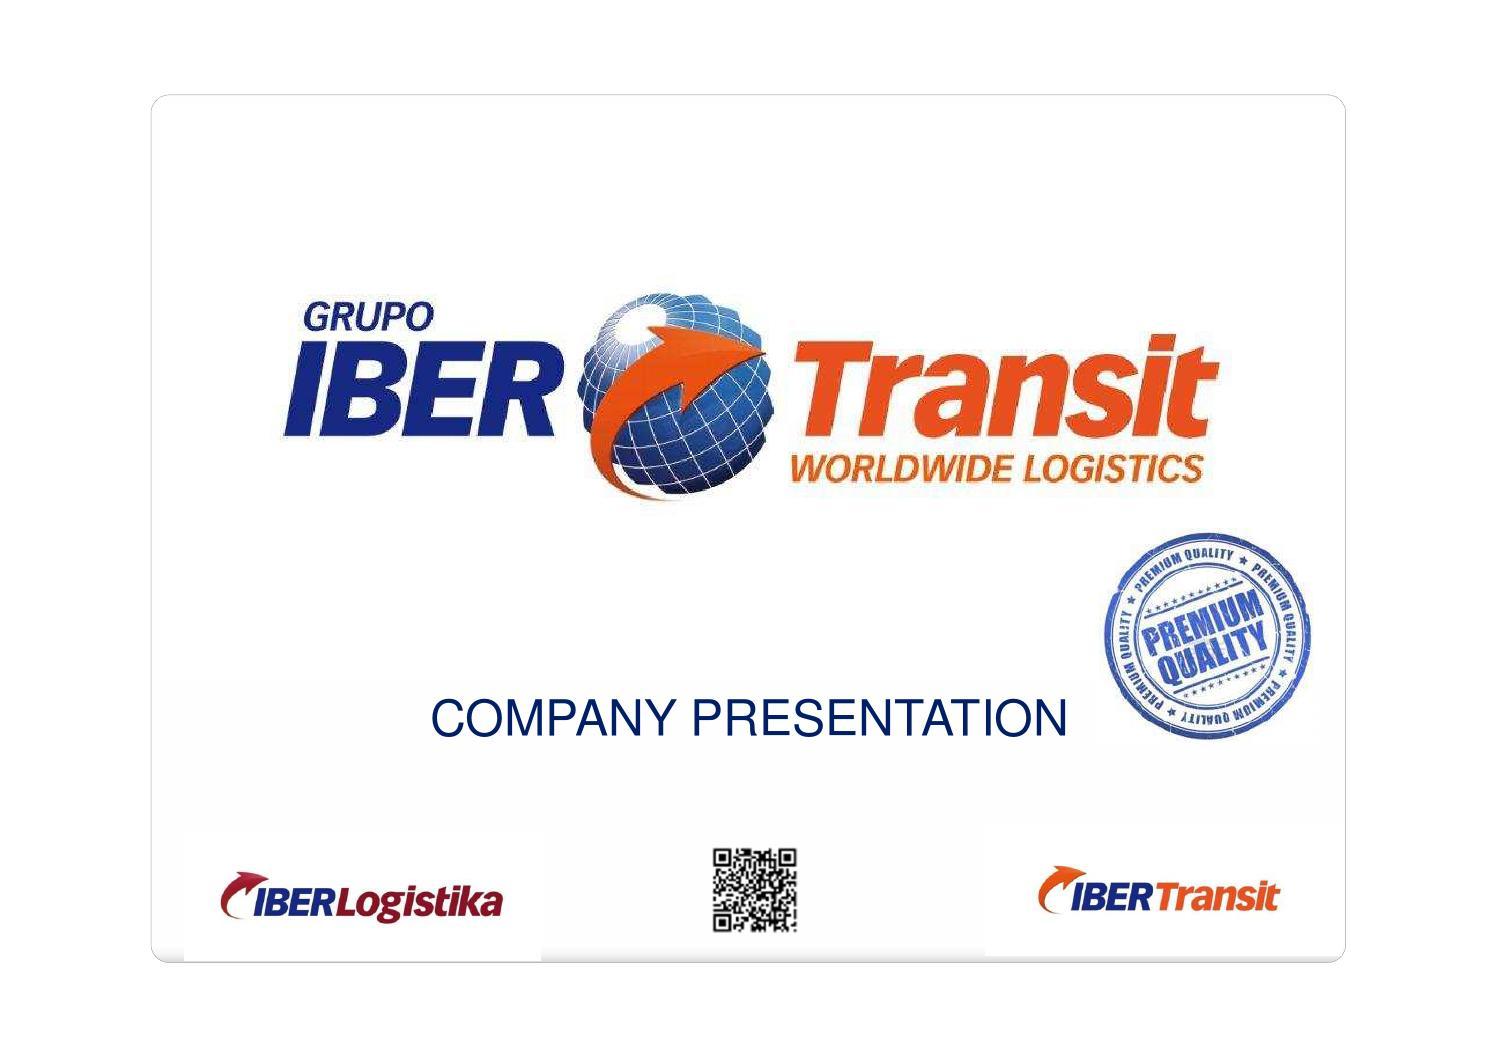 IBERTRANSIT GROUP - Company presentation 2014 by Xavier